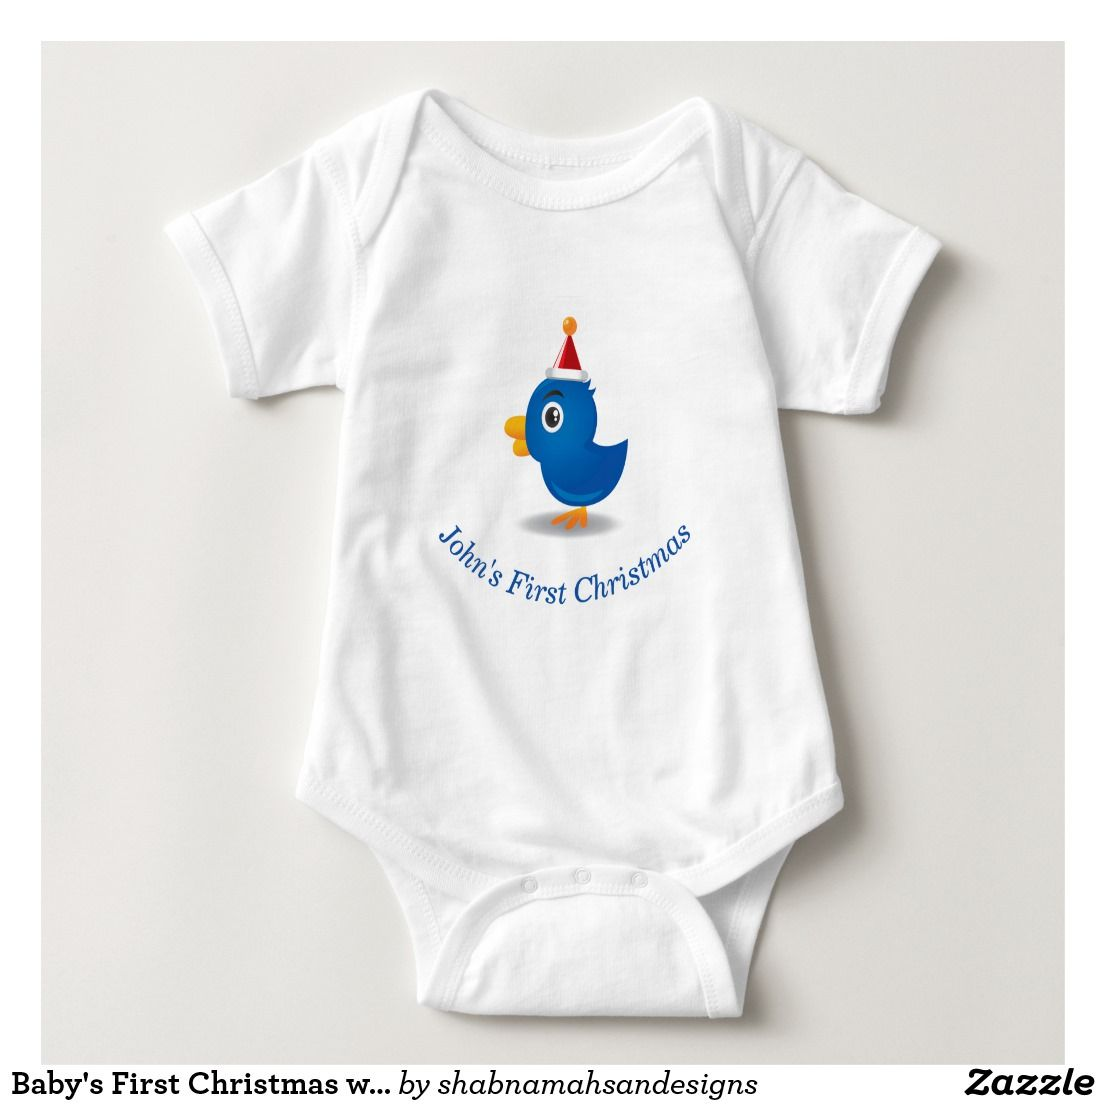 Babyus First Christmas with Cute Birdie Make your childus first